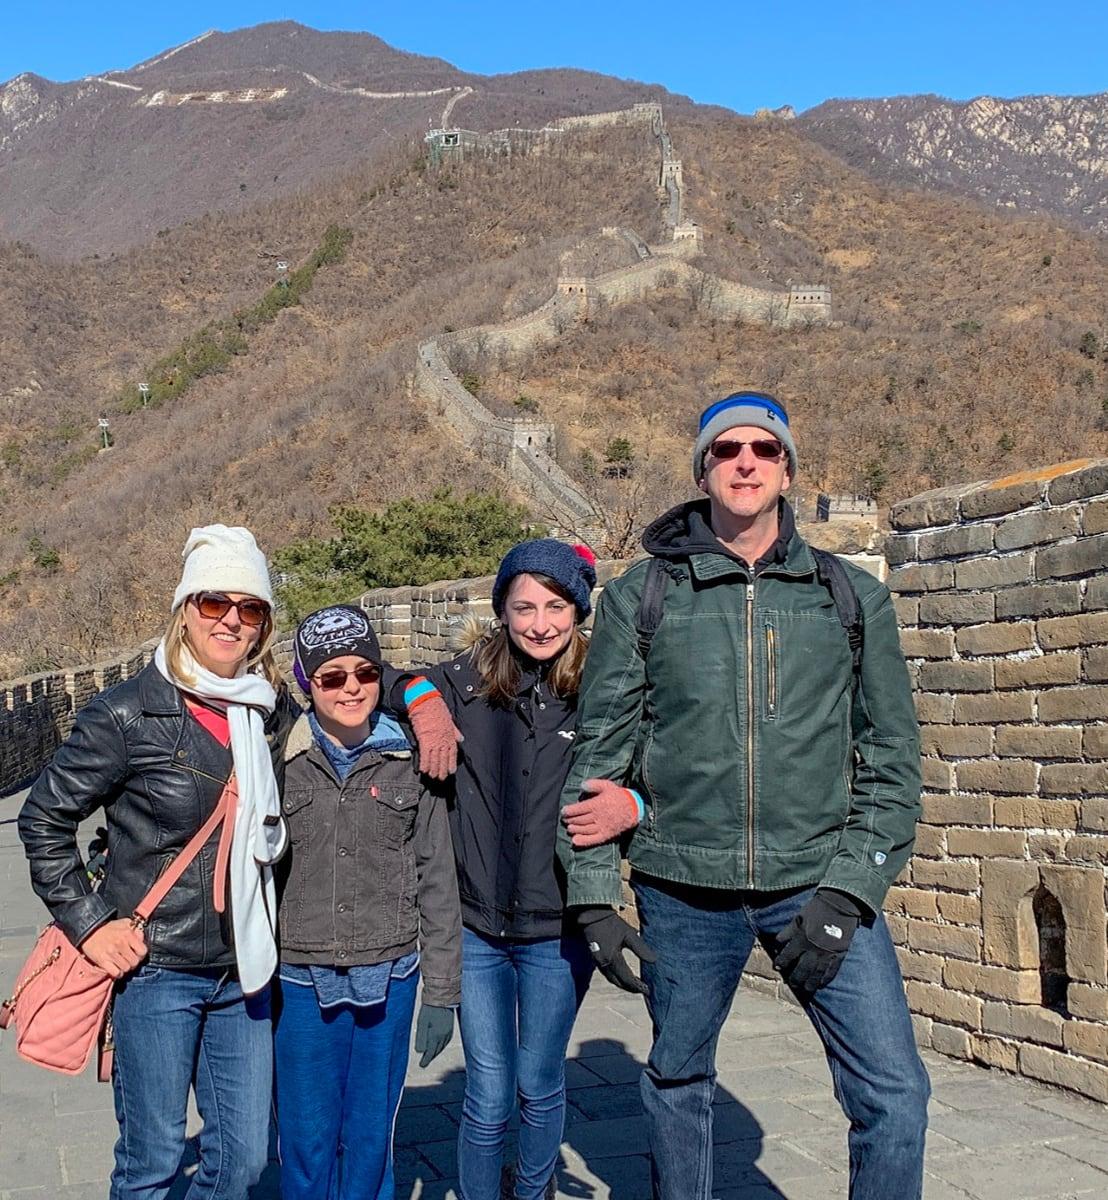 Travel Mamas Family on Great Wall of China